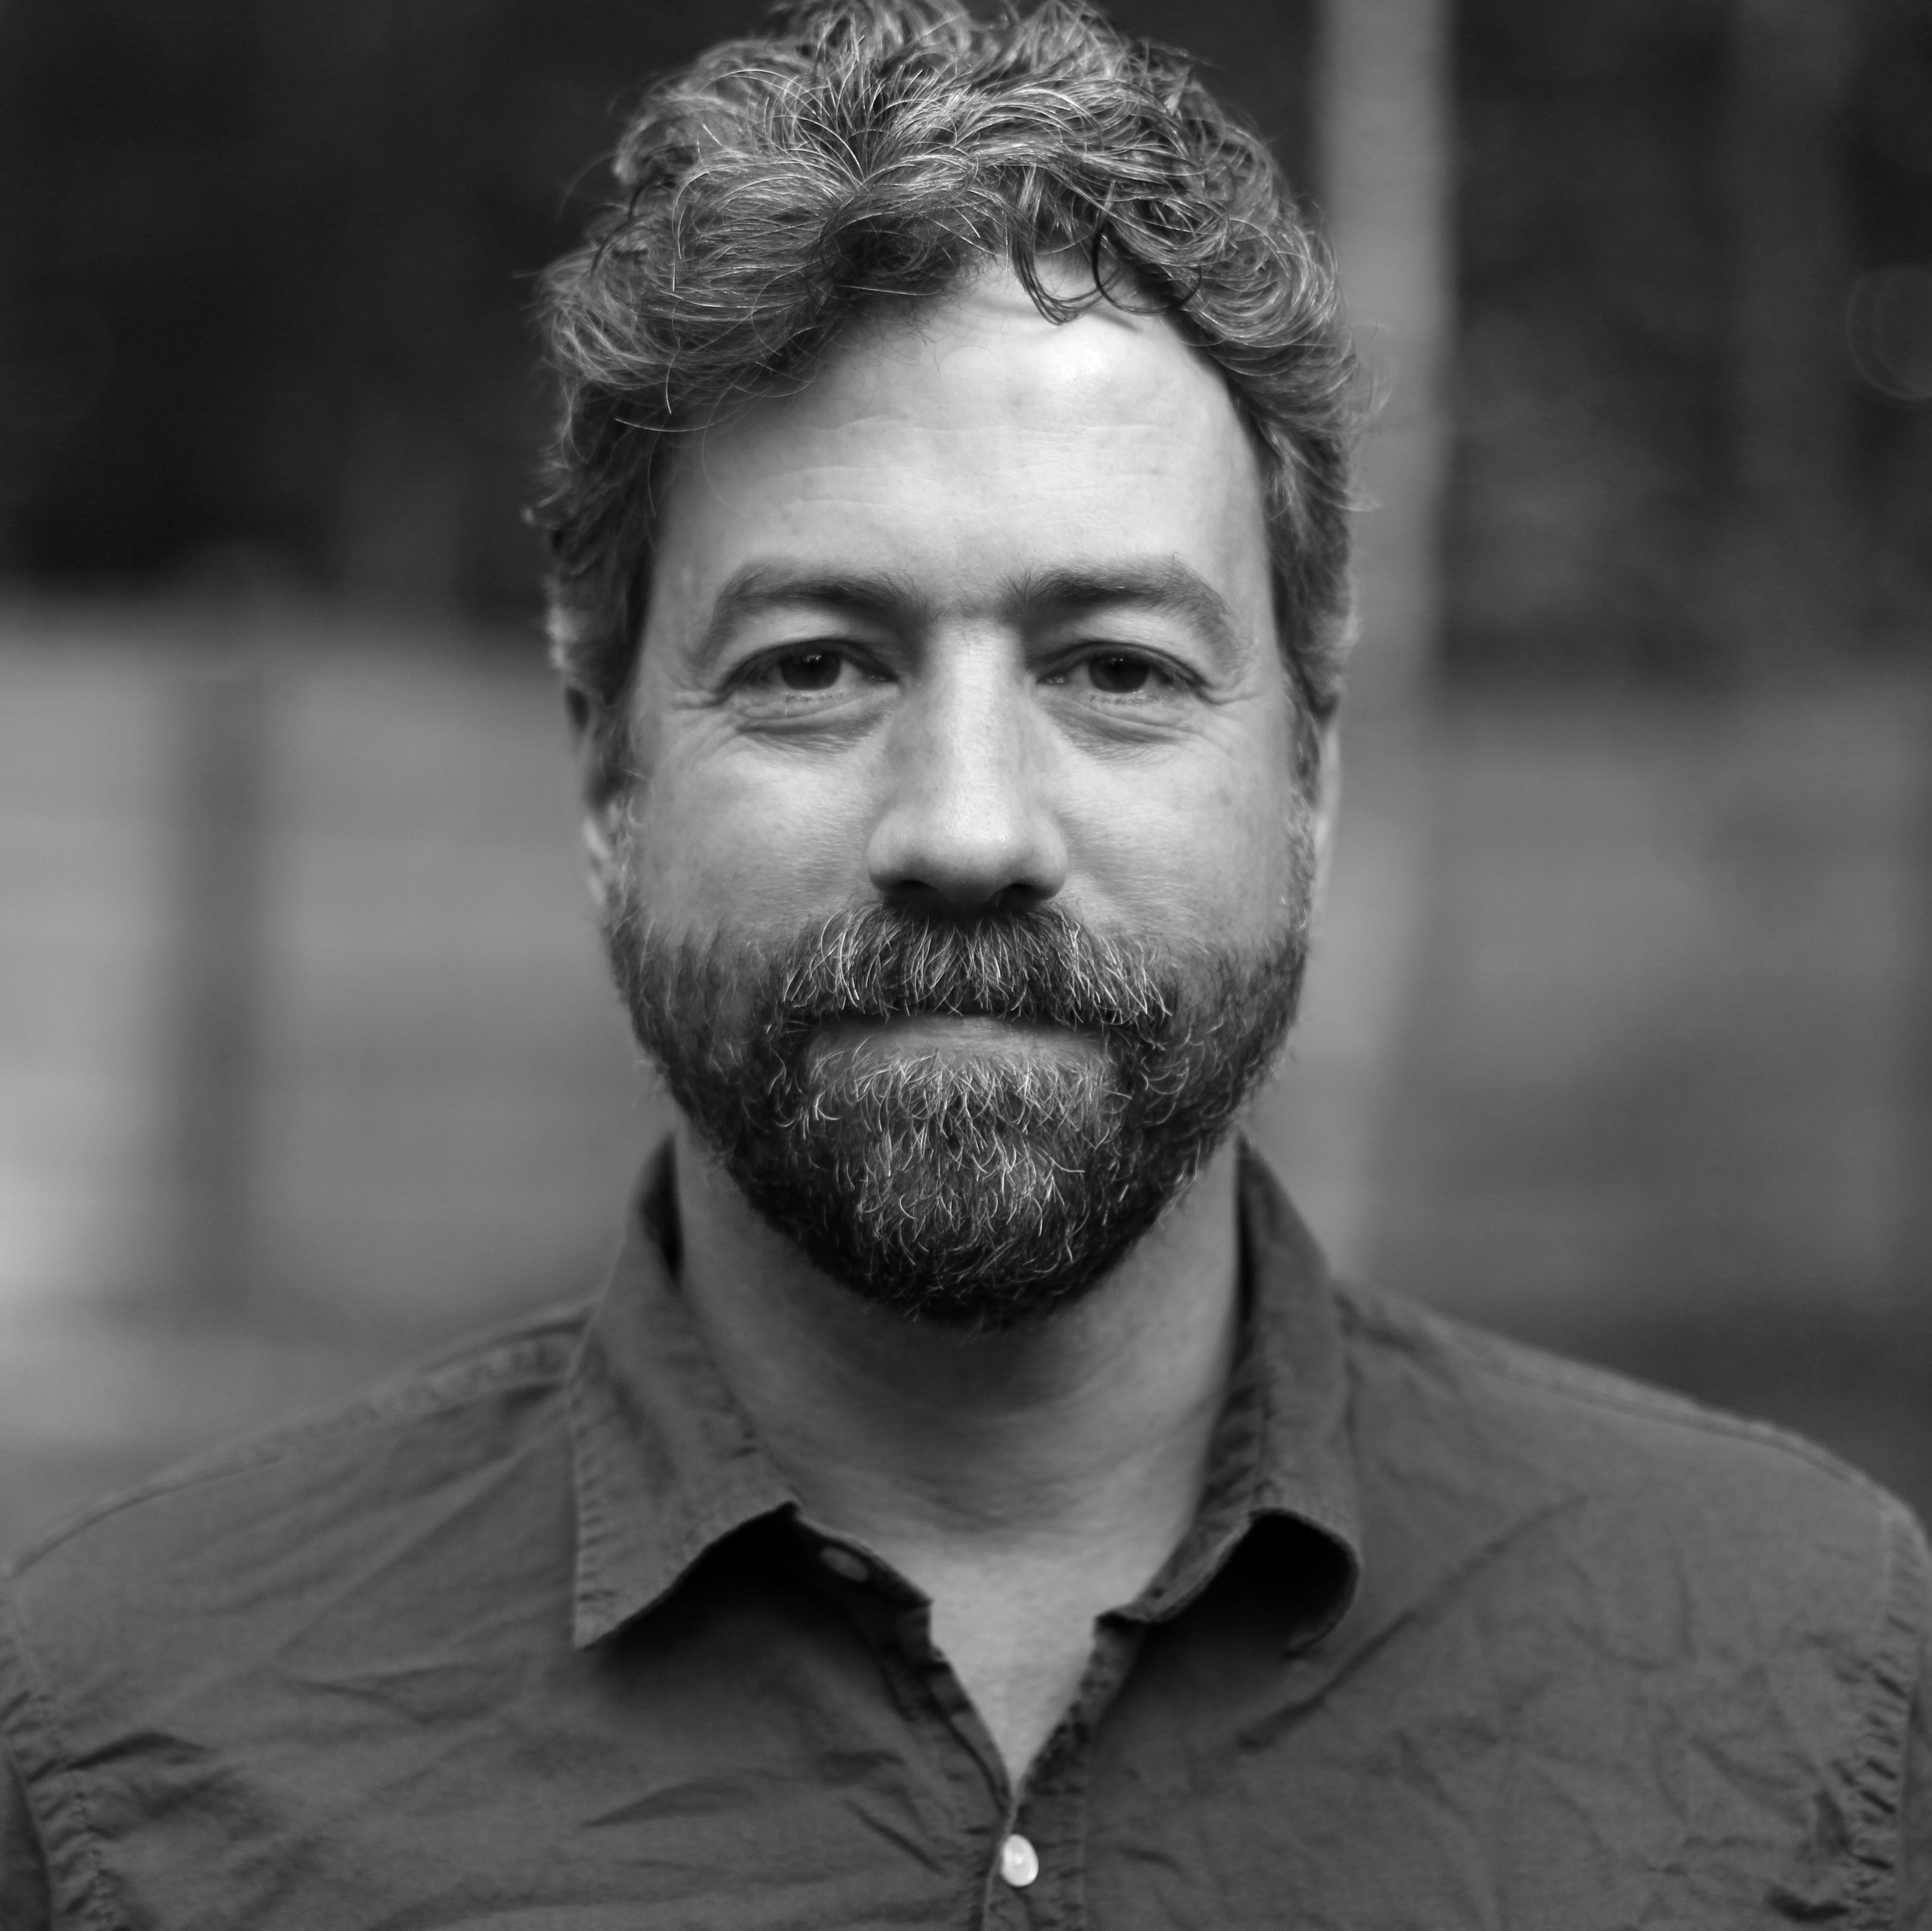 iEARN-USA Change Maker: Cbaer Christopher Baer